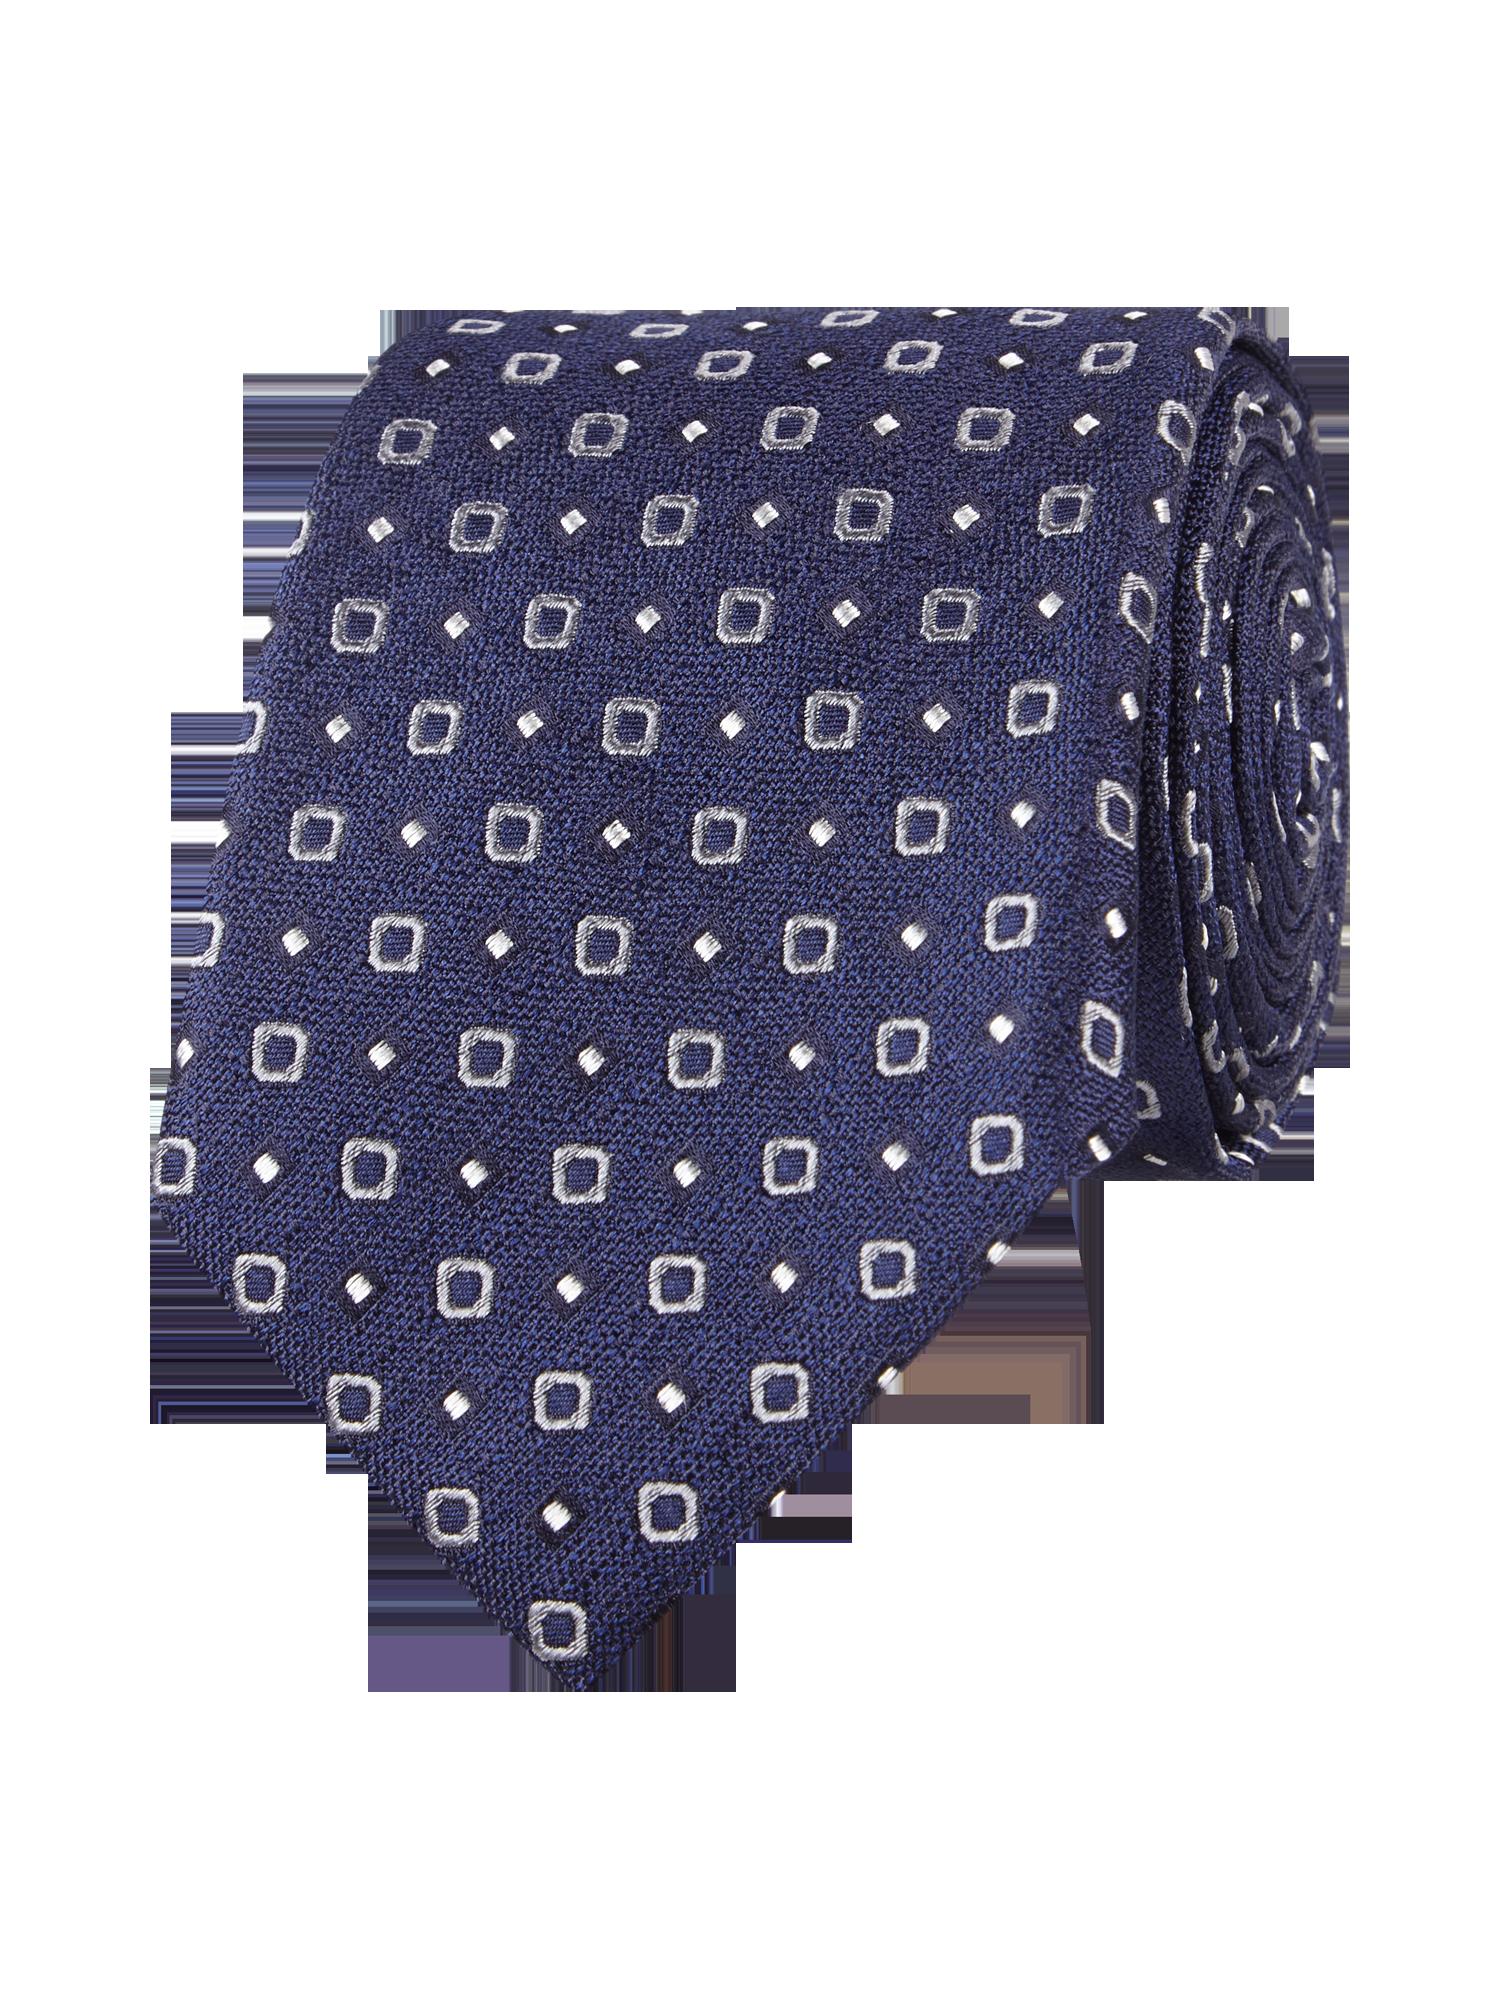 Eduard Dressler Krawatte Mit Allover Muster In Blau Turkis Online